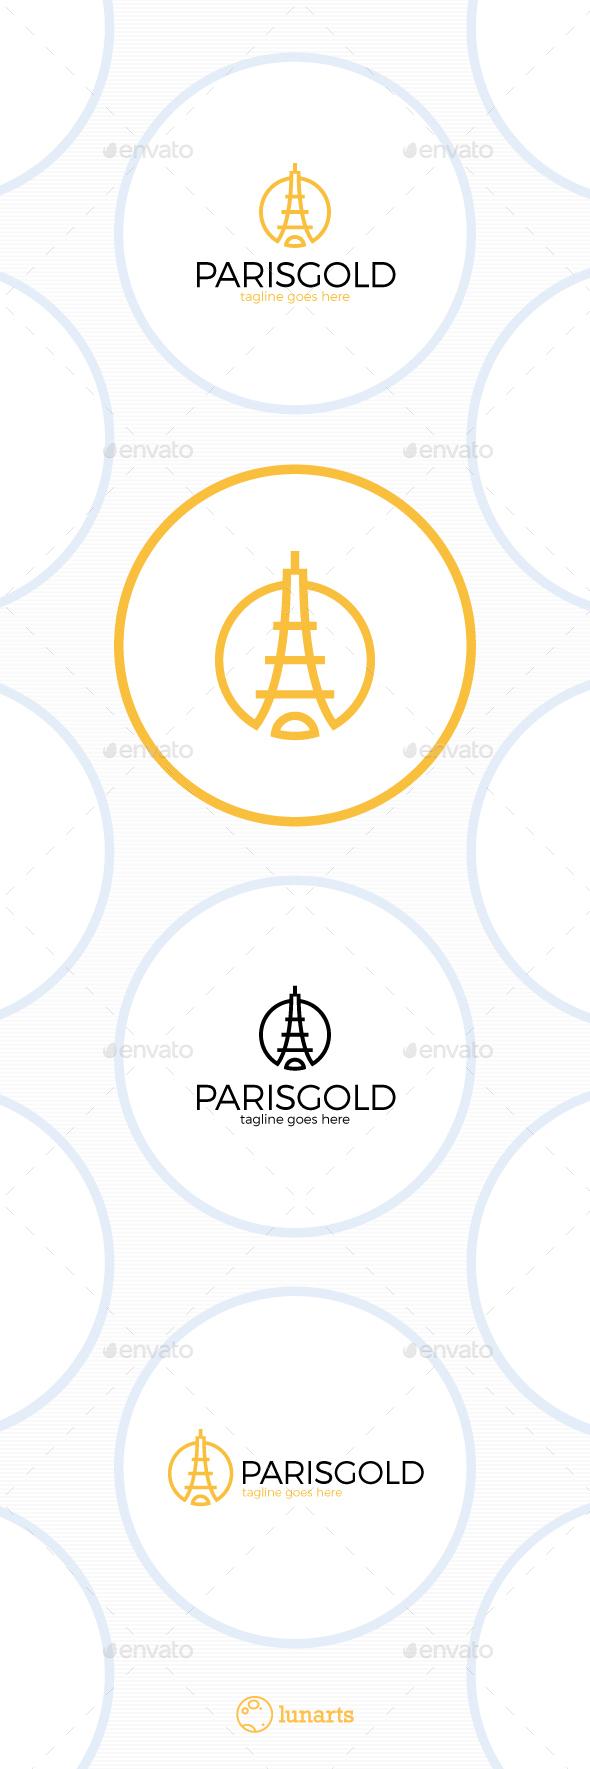 Paris Gold Logo - Luxury Tower